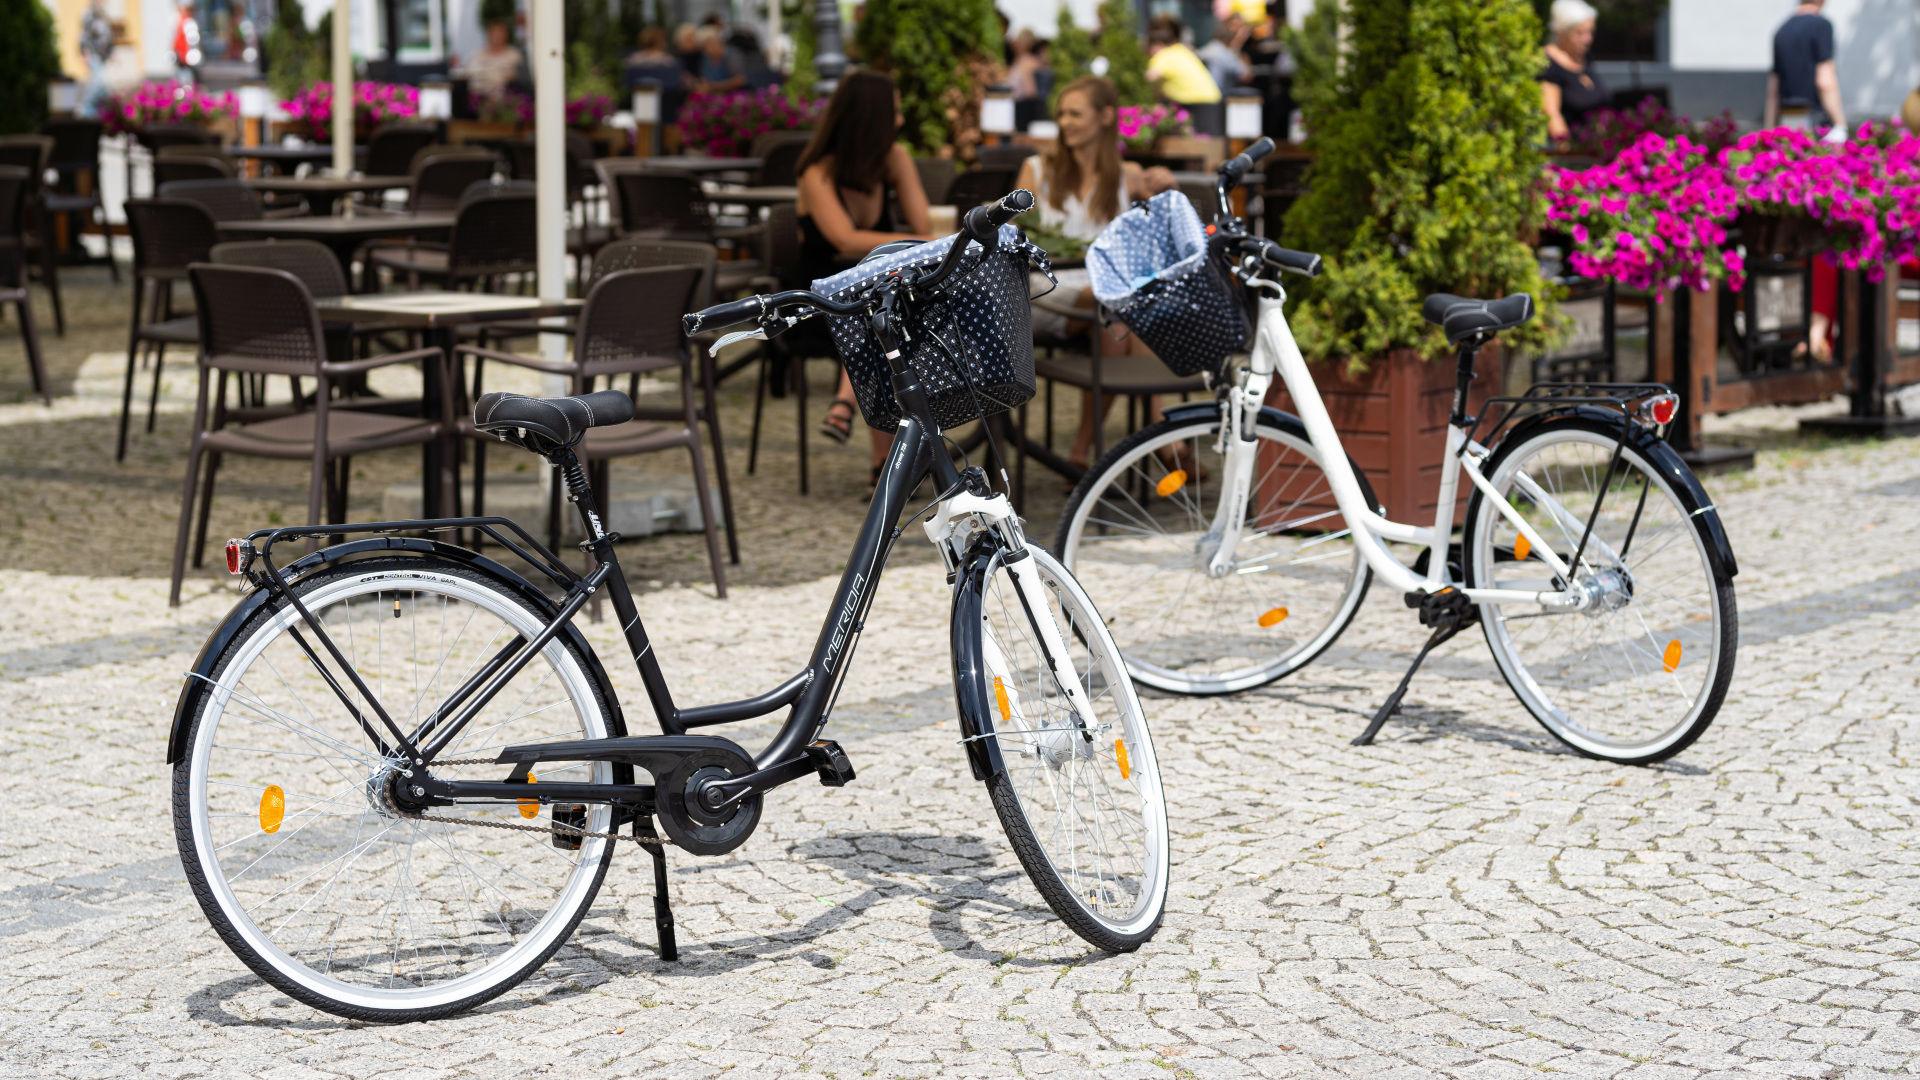 rower miejski, Merida, rowery Merida, Merida Cityway, Merida Classicway, rowery miejskie, rower do miasta